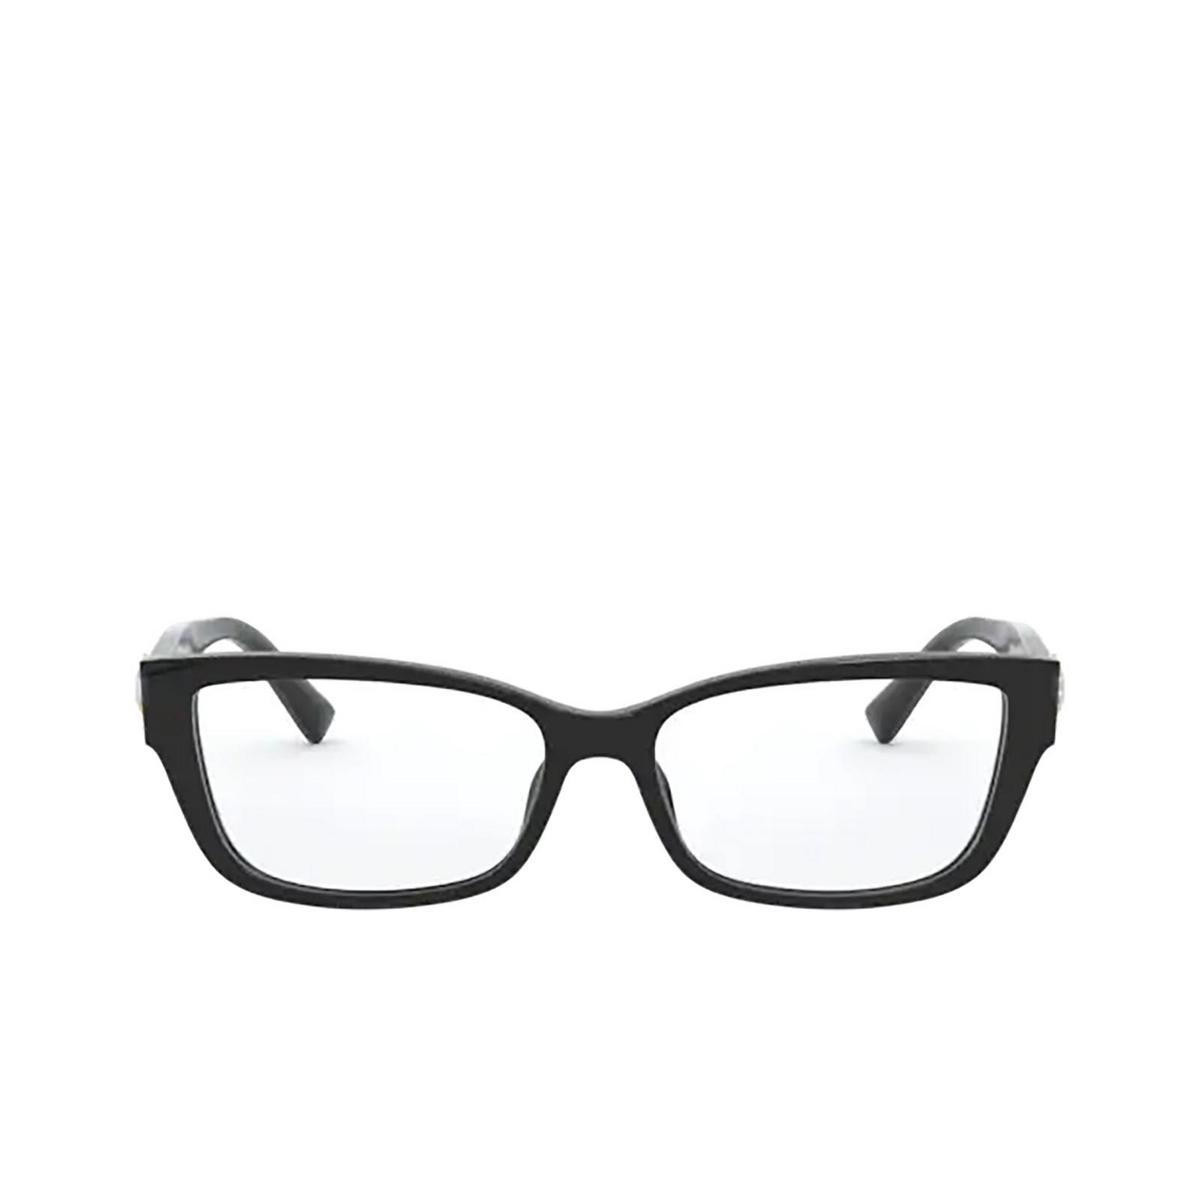 Versace® Rectangle Eyeglasses: VE3284B color Black GB1 - front view.